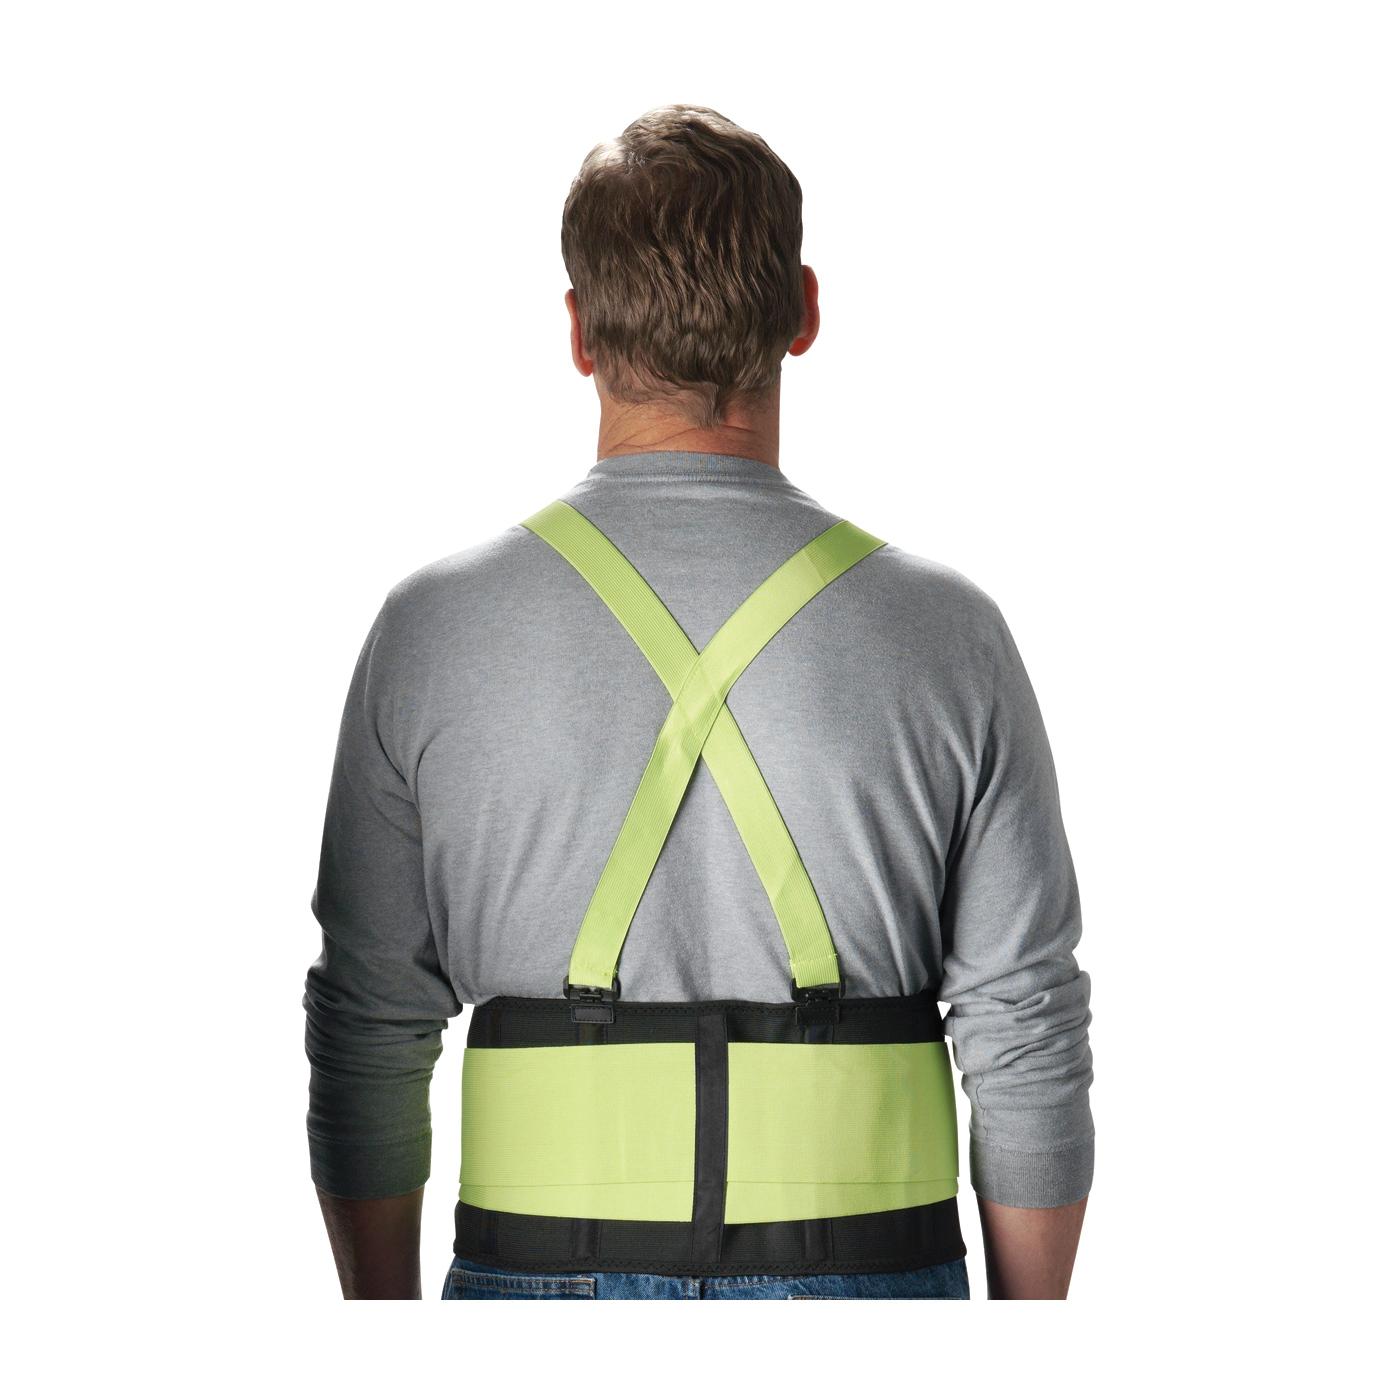 PIP® 290-550L Ergonomic Back Support Belt, L, 40 to 44 in Fits Waist, 8 in W, Nylon Elastic, Black/Hi-Viz Lime, Hook and Loop Closure